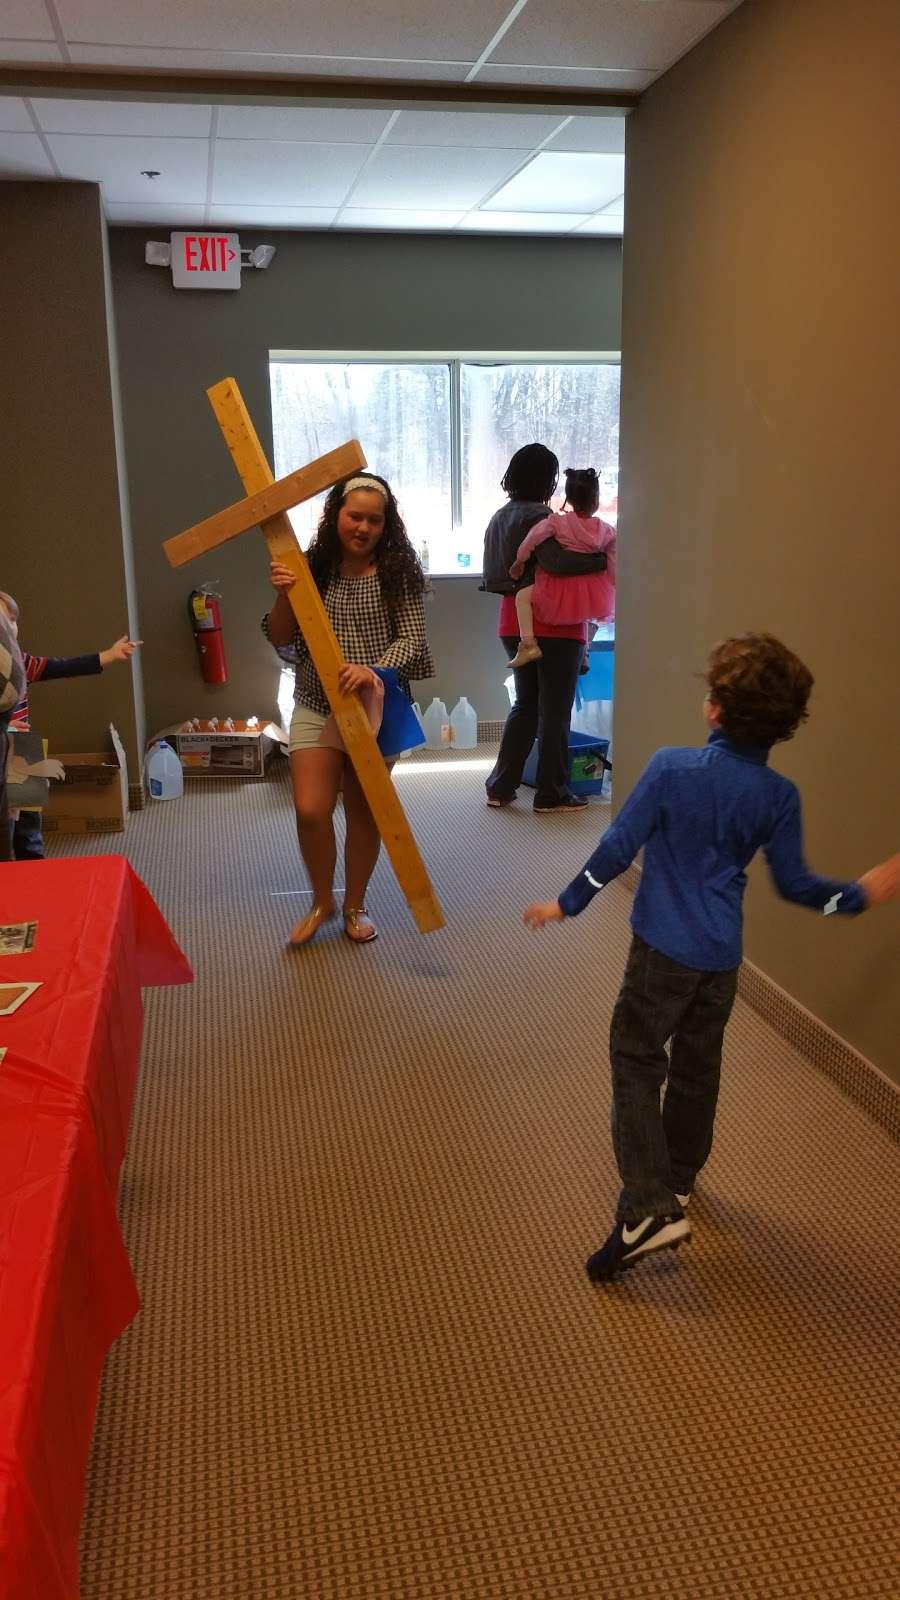 Abundant Life Christian Center - church    Photo 4 of 7   Address: 2245 US-130, Dayton, NJ 08810, USA   Phone: (732) 355-0225